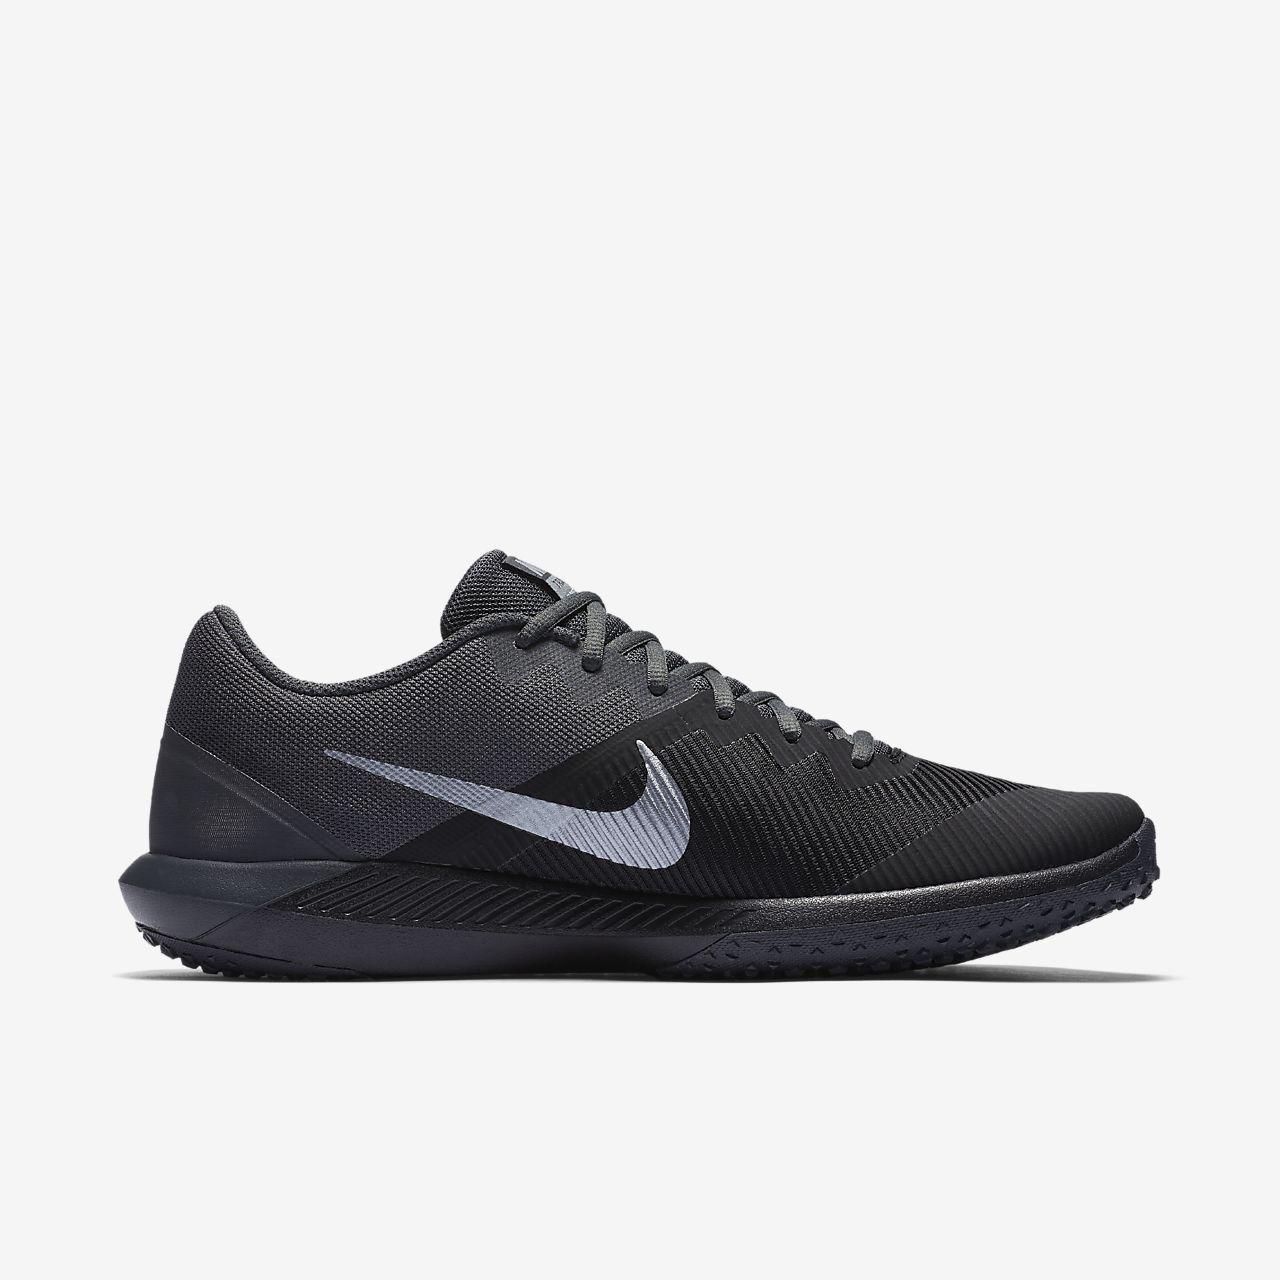 Nike Performance RETALIATION TR 2 - Sports shoes - black/white/anthracite ia5DceYMOe